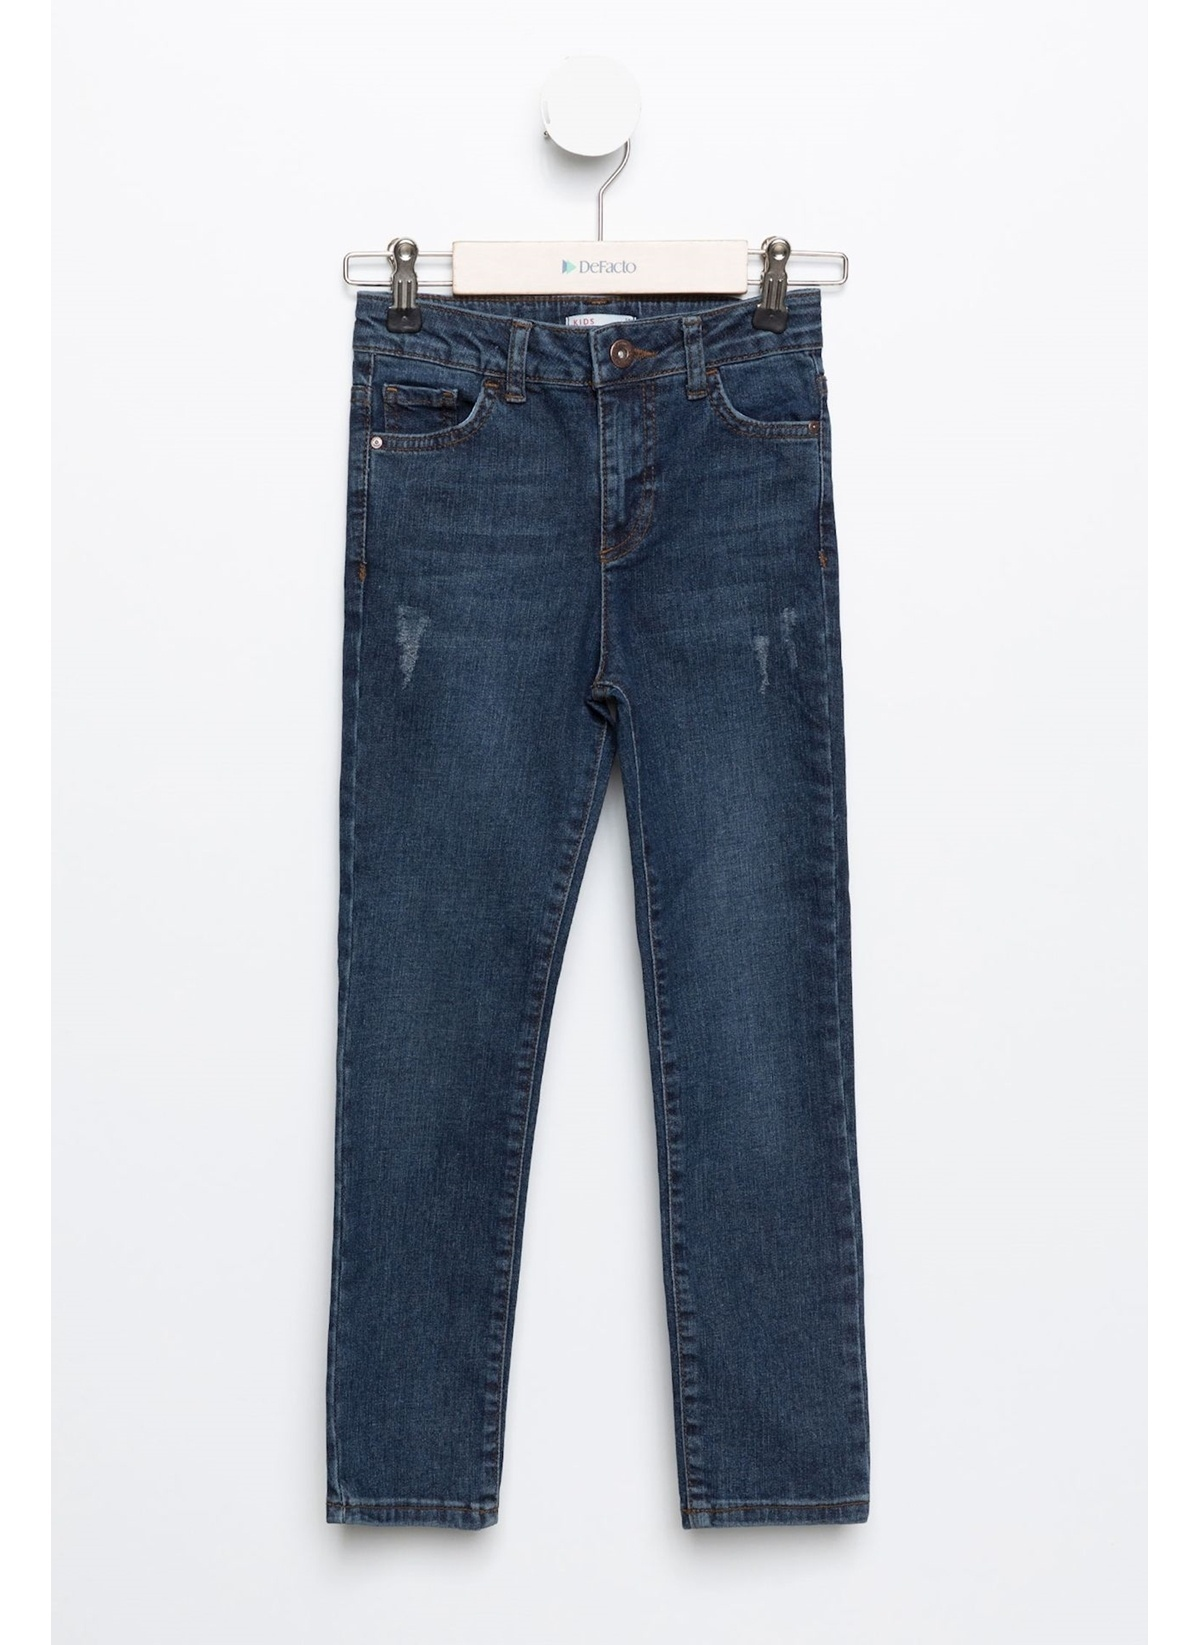 Defacto Pantolon J9797a619spbe364 5 Cep Slim Fit Jean Pan – 49.99 TL